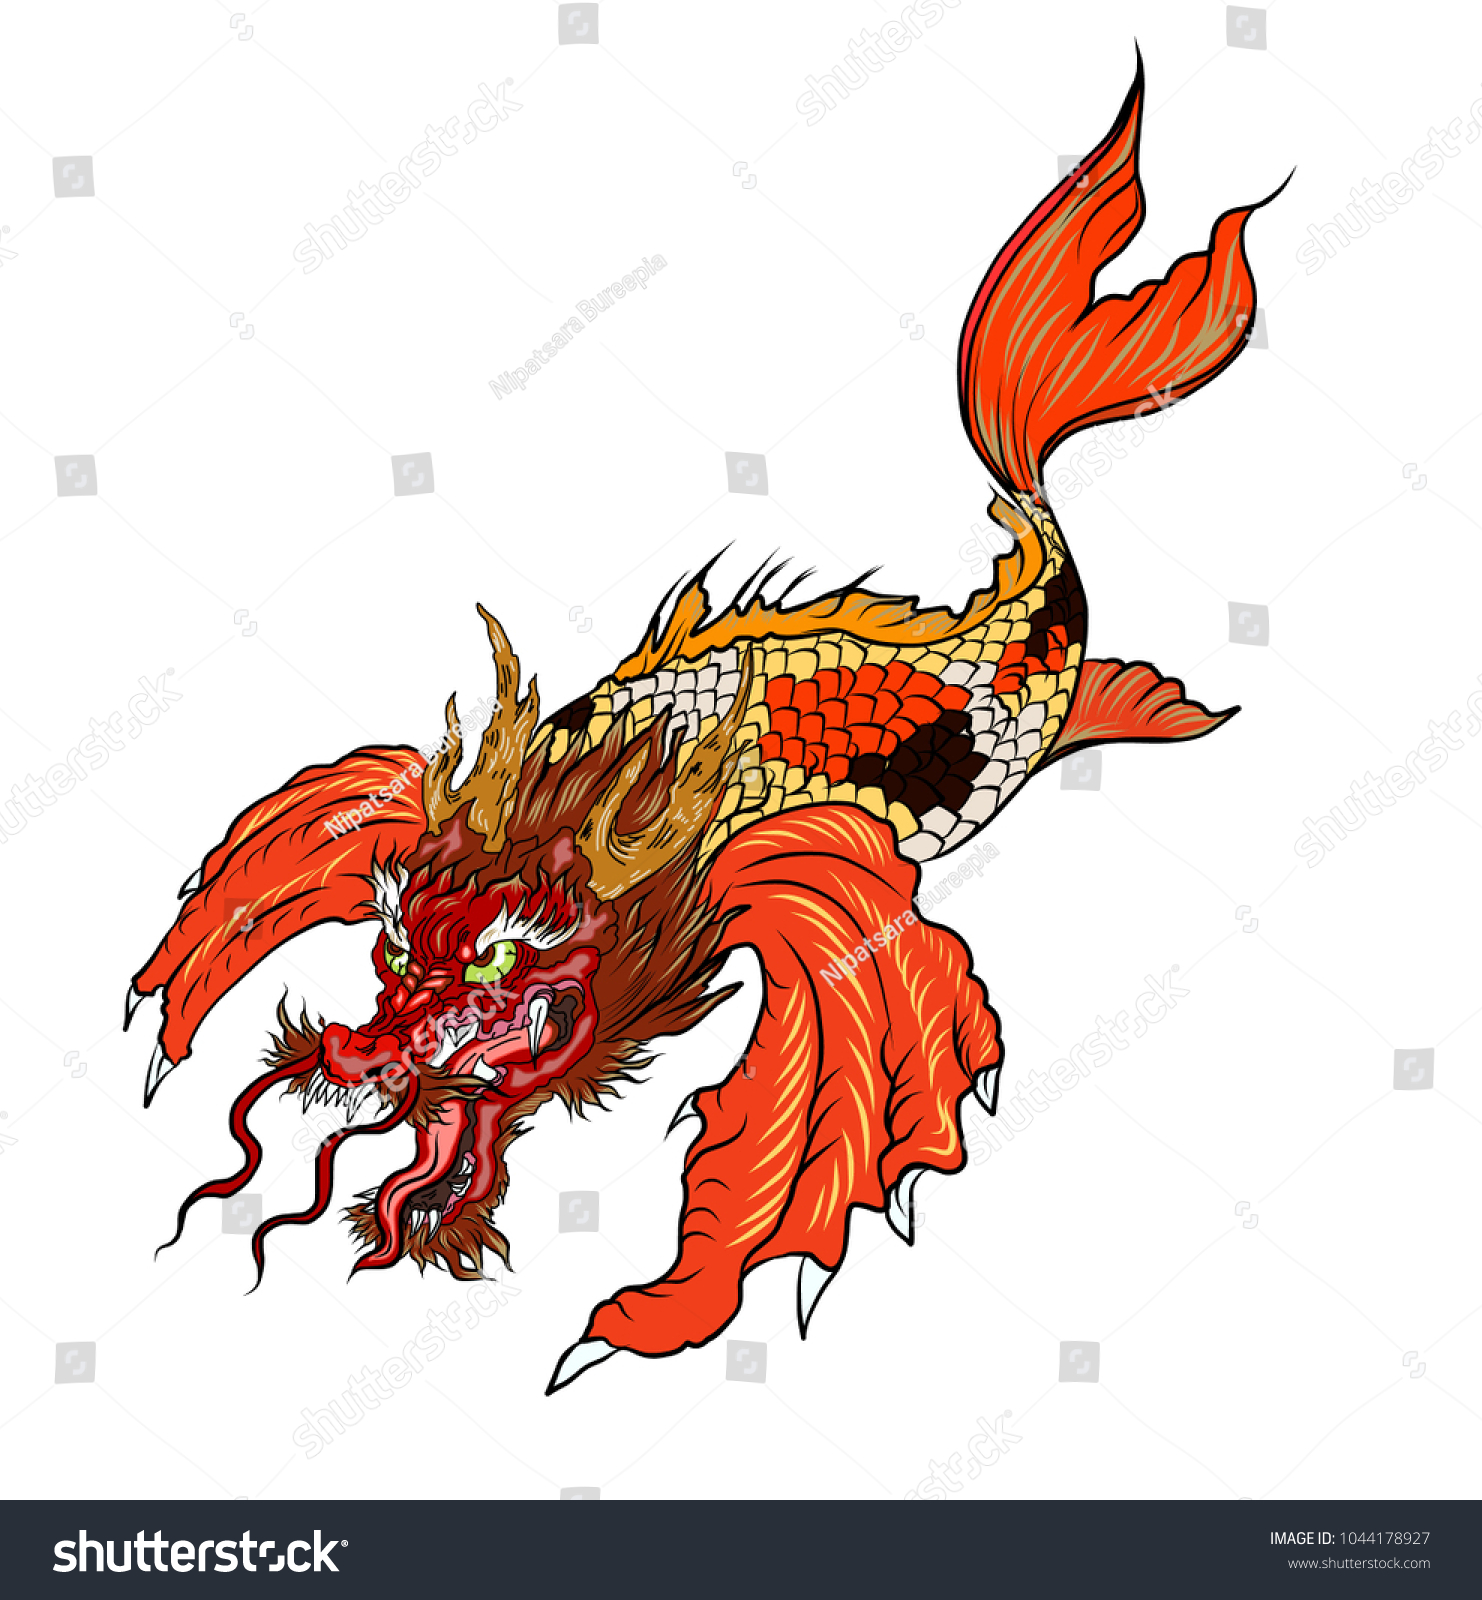 Dragon Carp Fish Photos >> Free Dragon Carp Art Prints And Wall ...